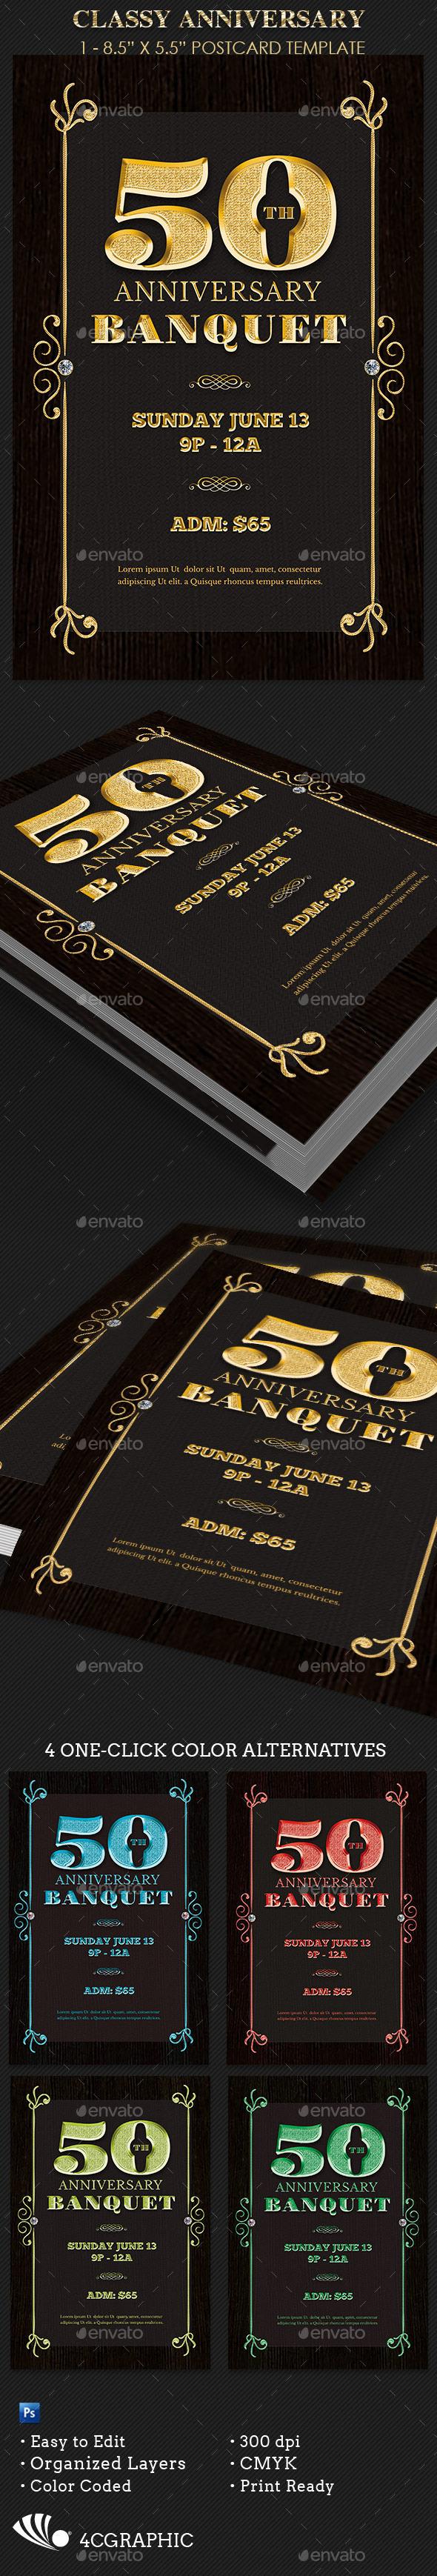 Golden Anniversary Banquet Flyer Template - Events Flyers